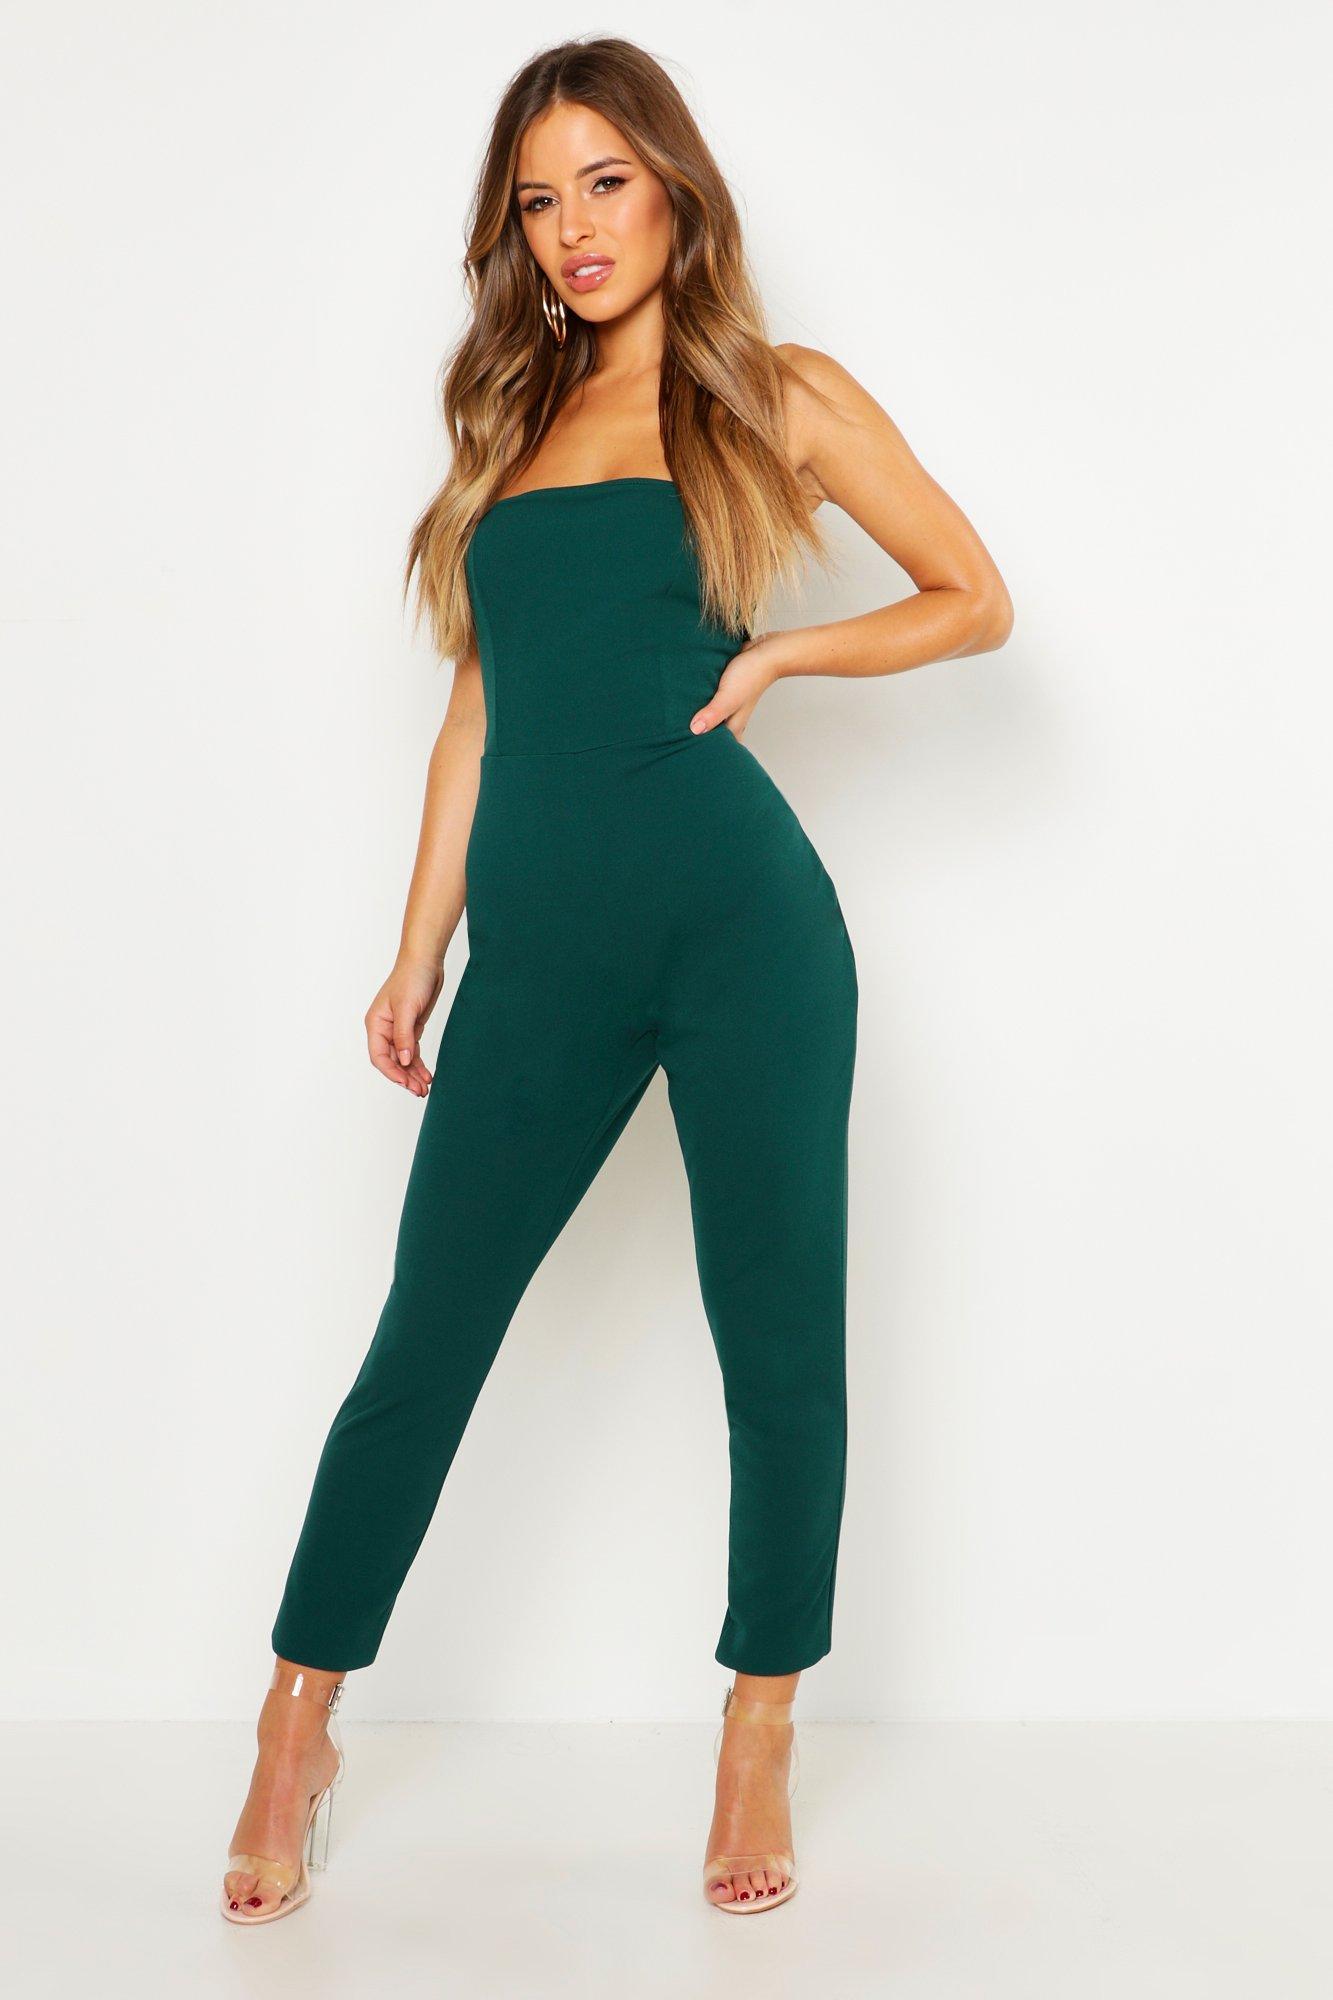 boohoo Womens Petite Bandeau Straight Leg Jumpsuit - Green - 12, Green